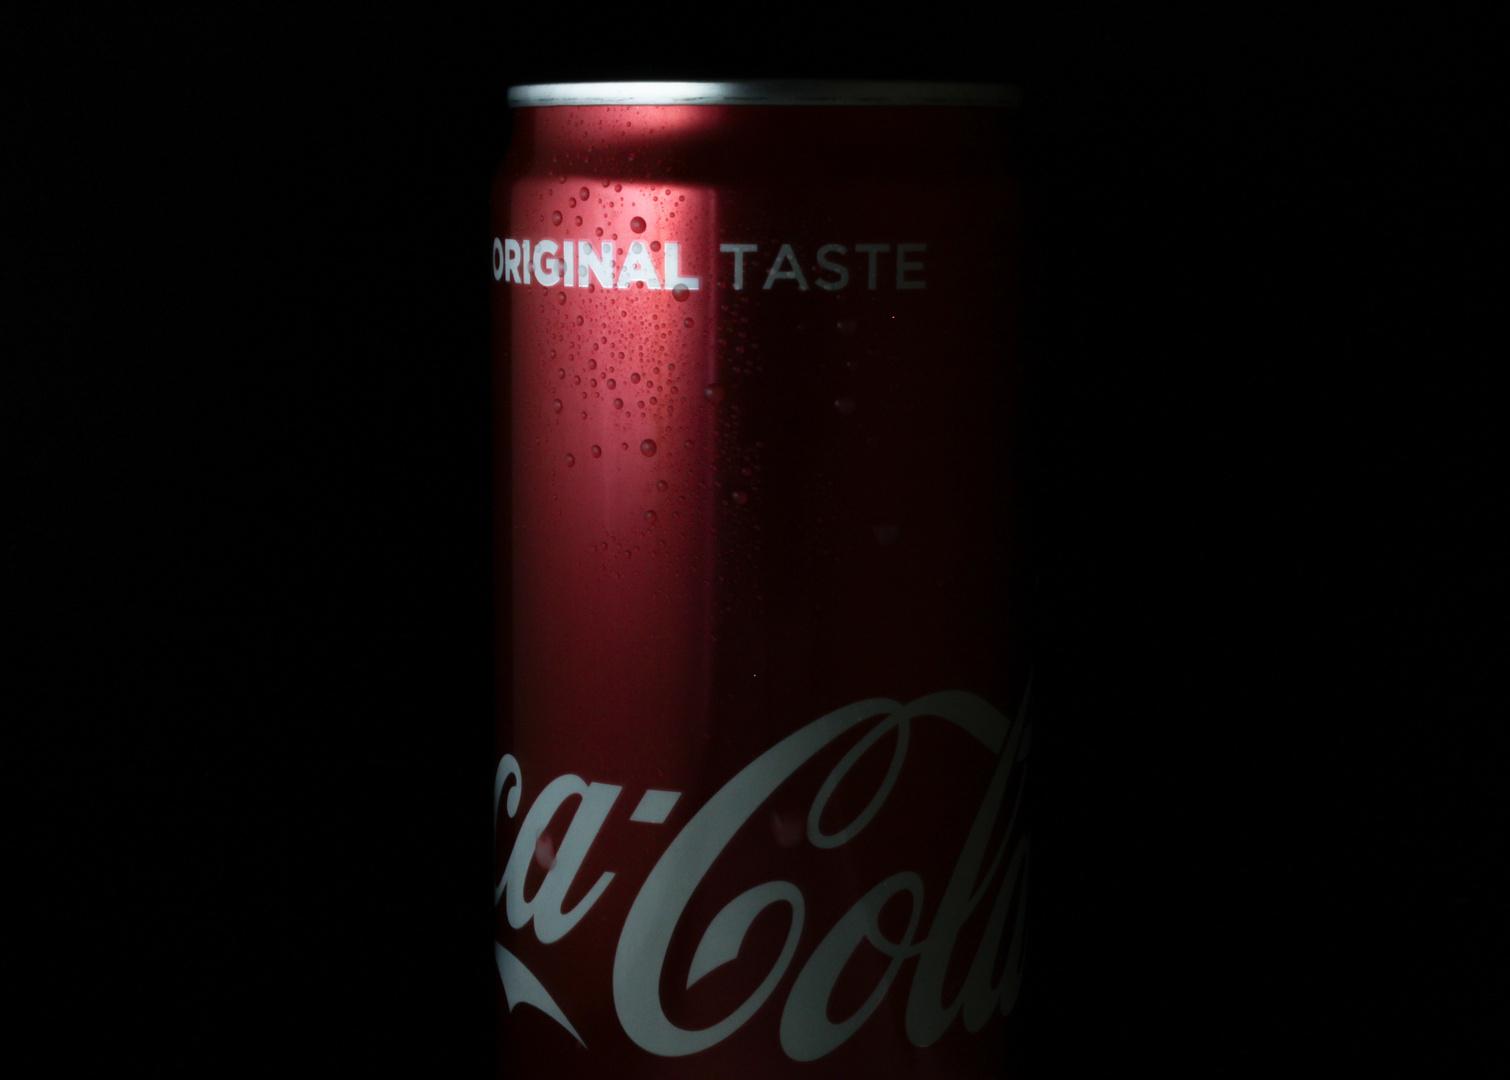 Fresh Coke